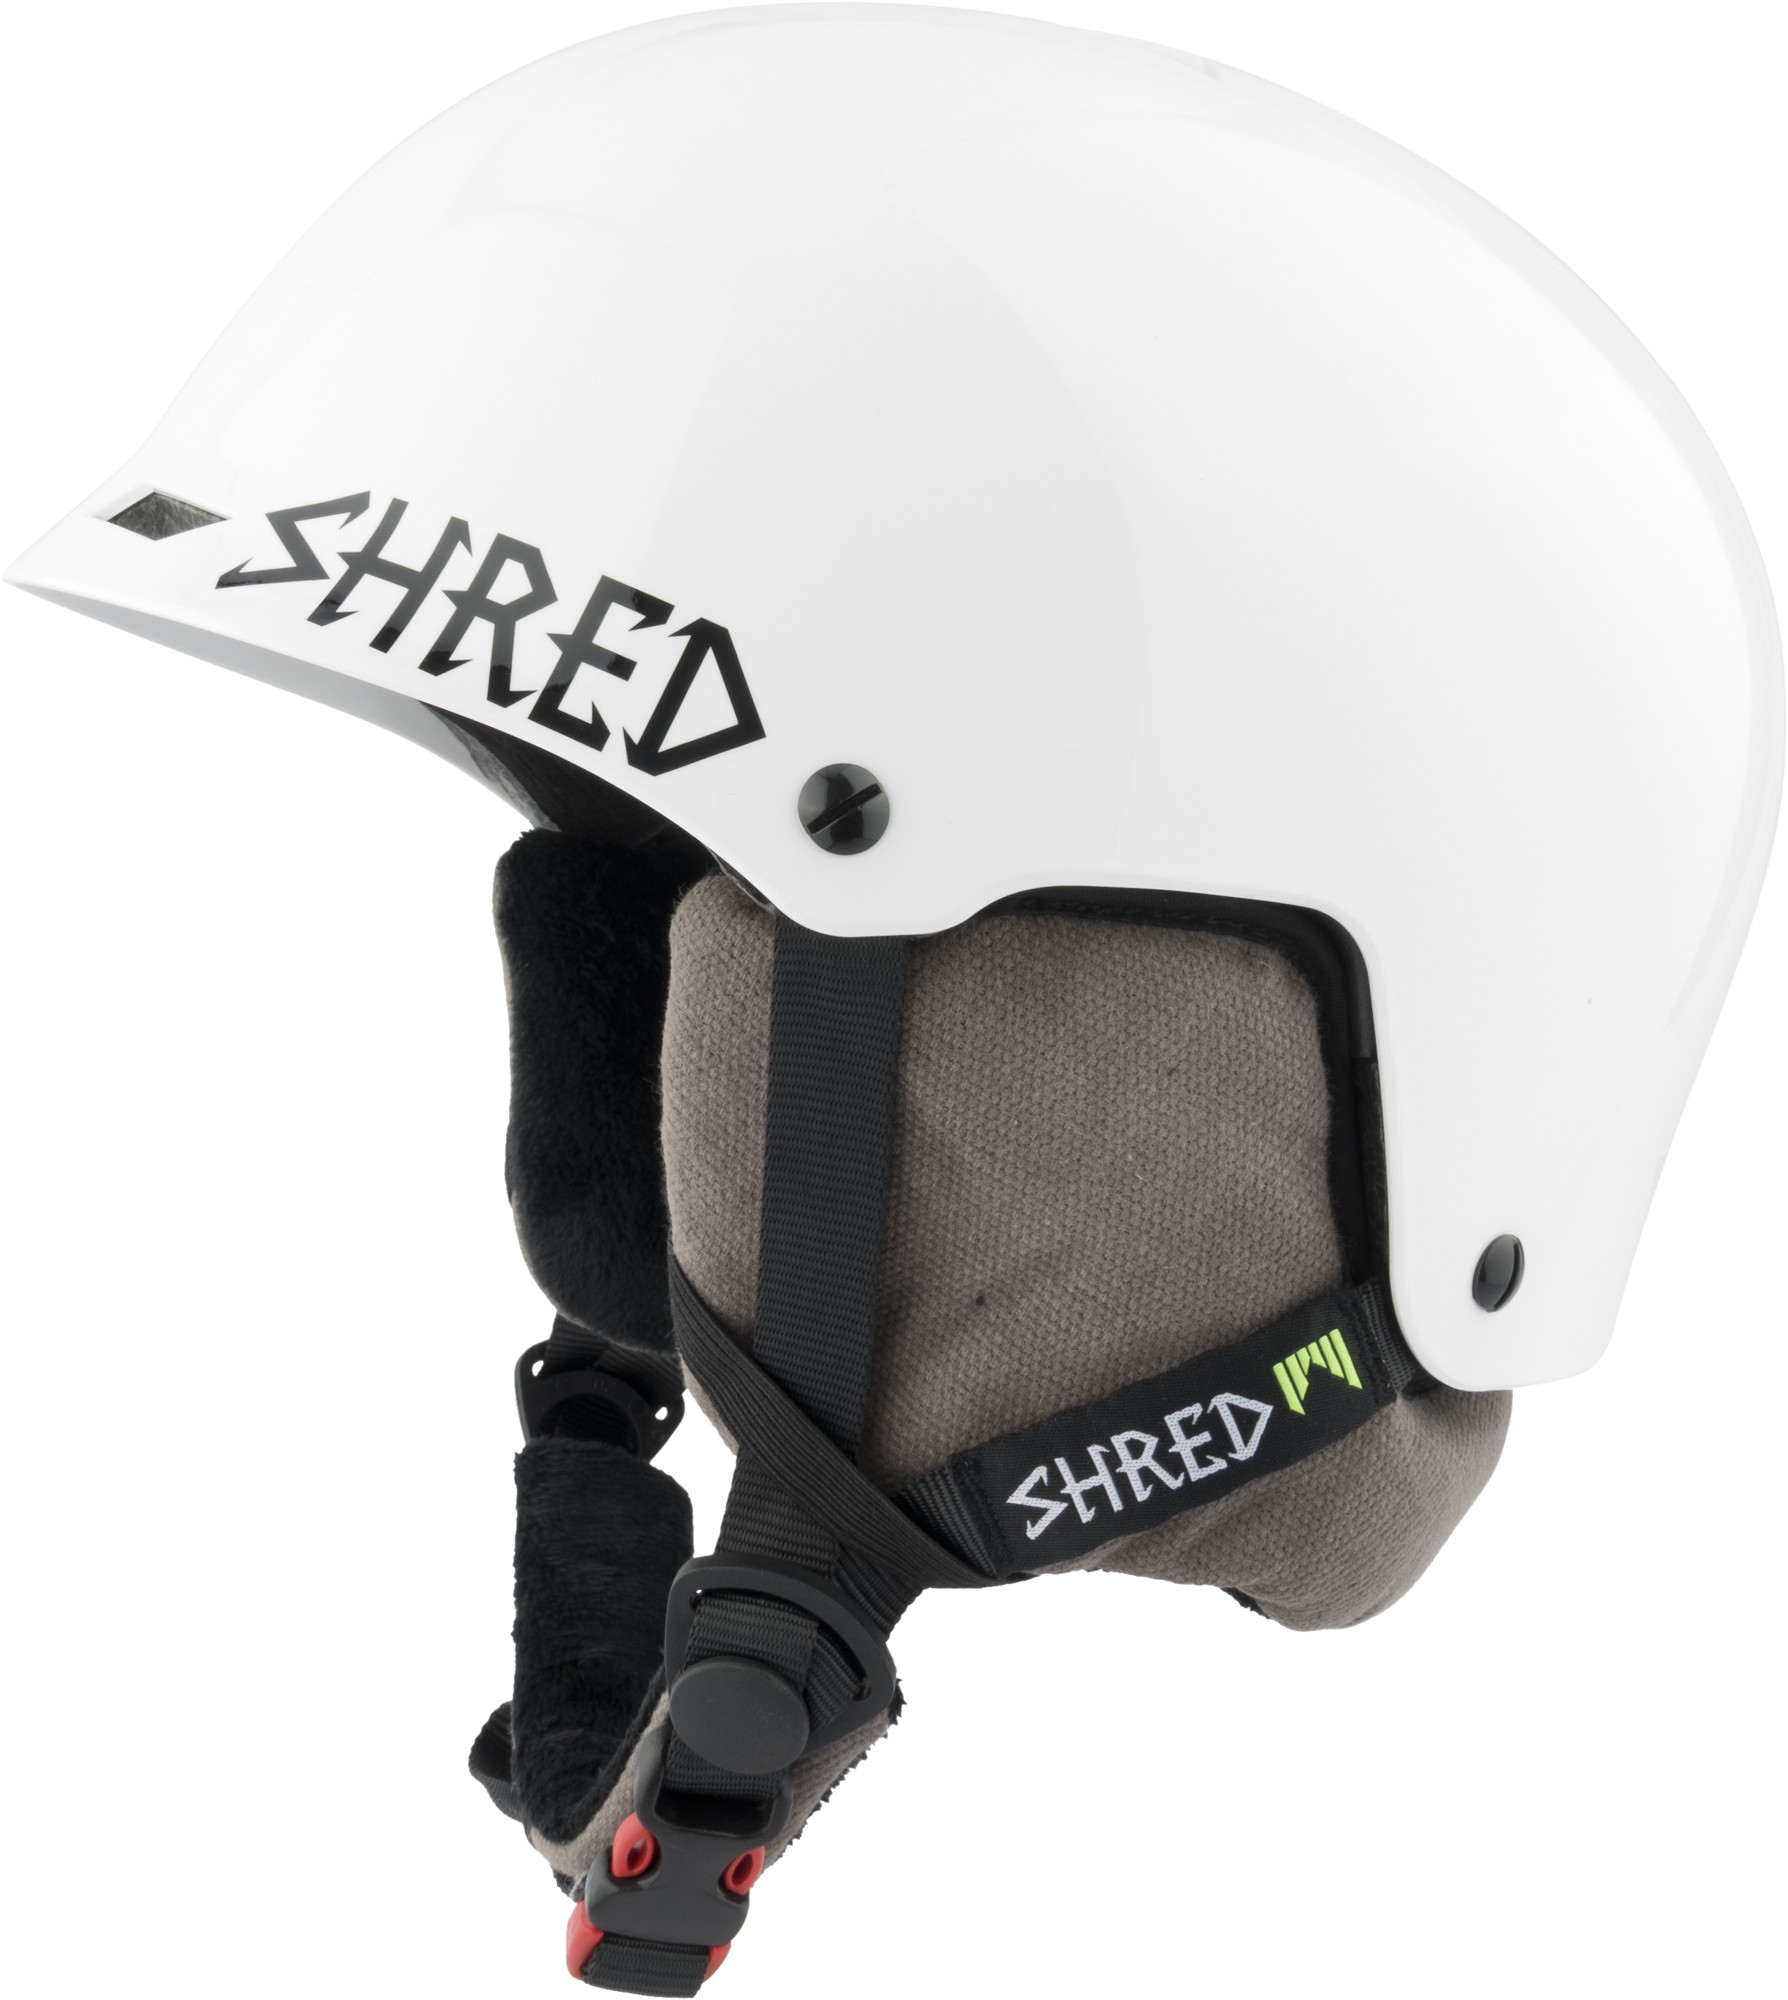 Shred HALF BRAIN D-LUX BLEACH ski helmet, 2018